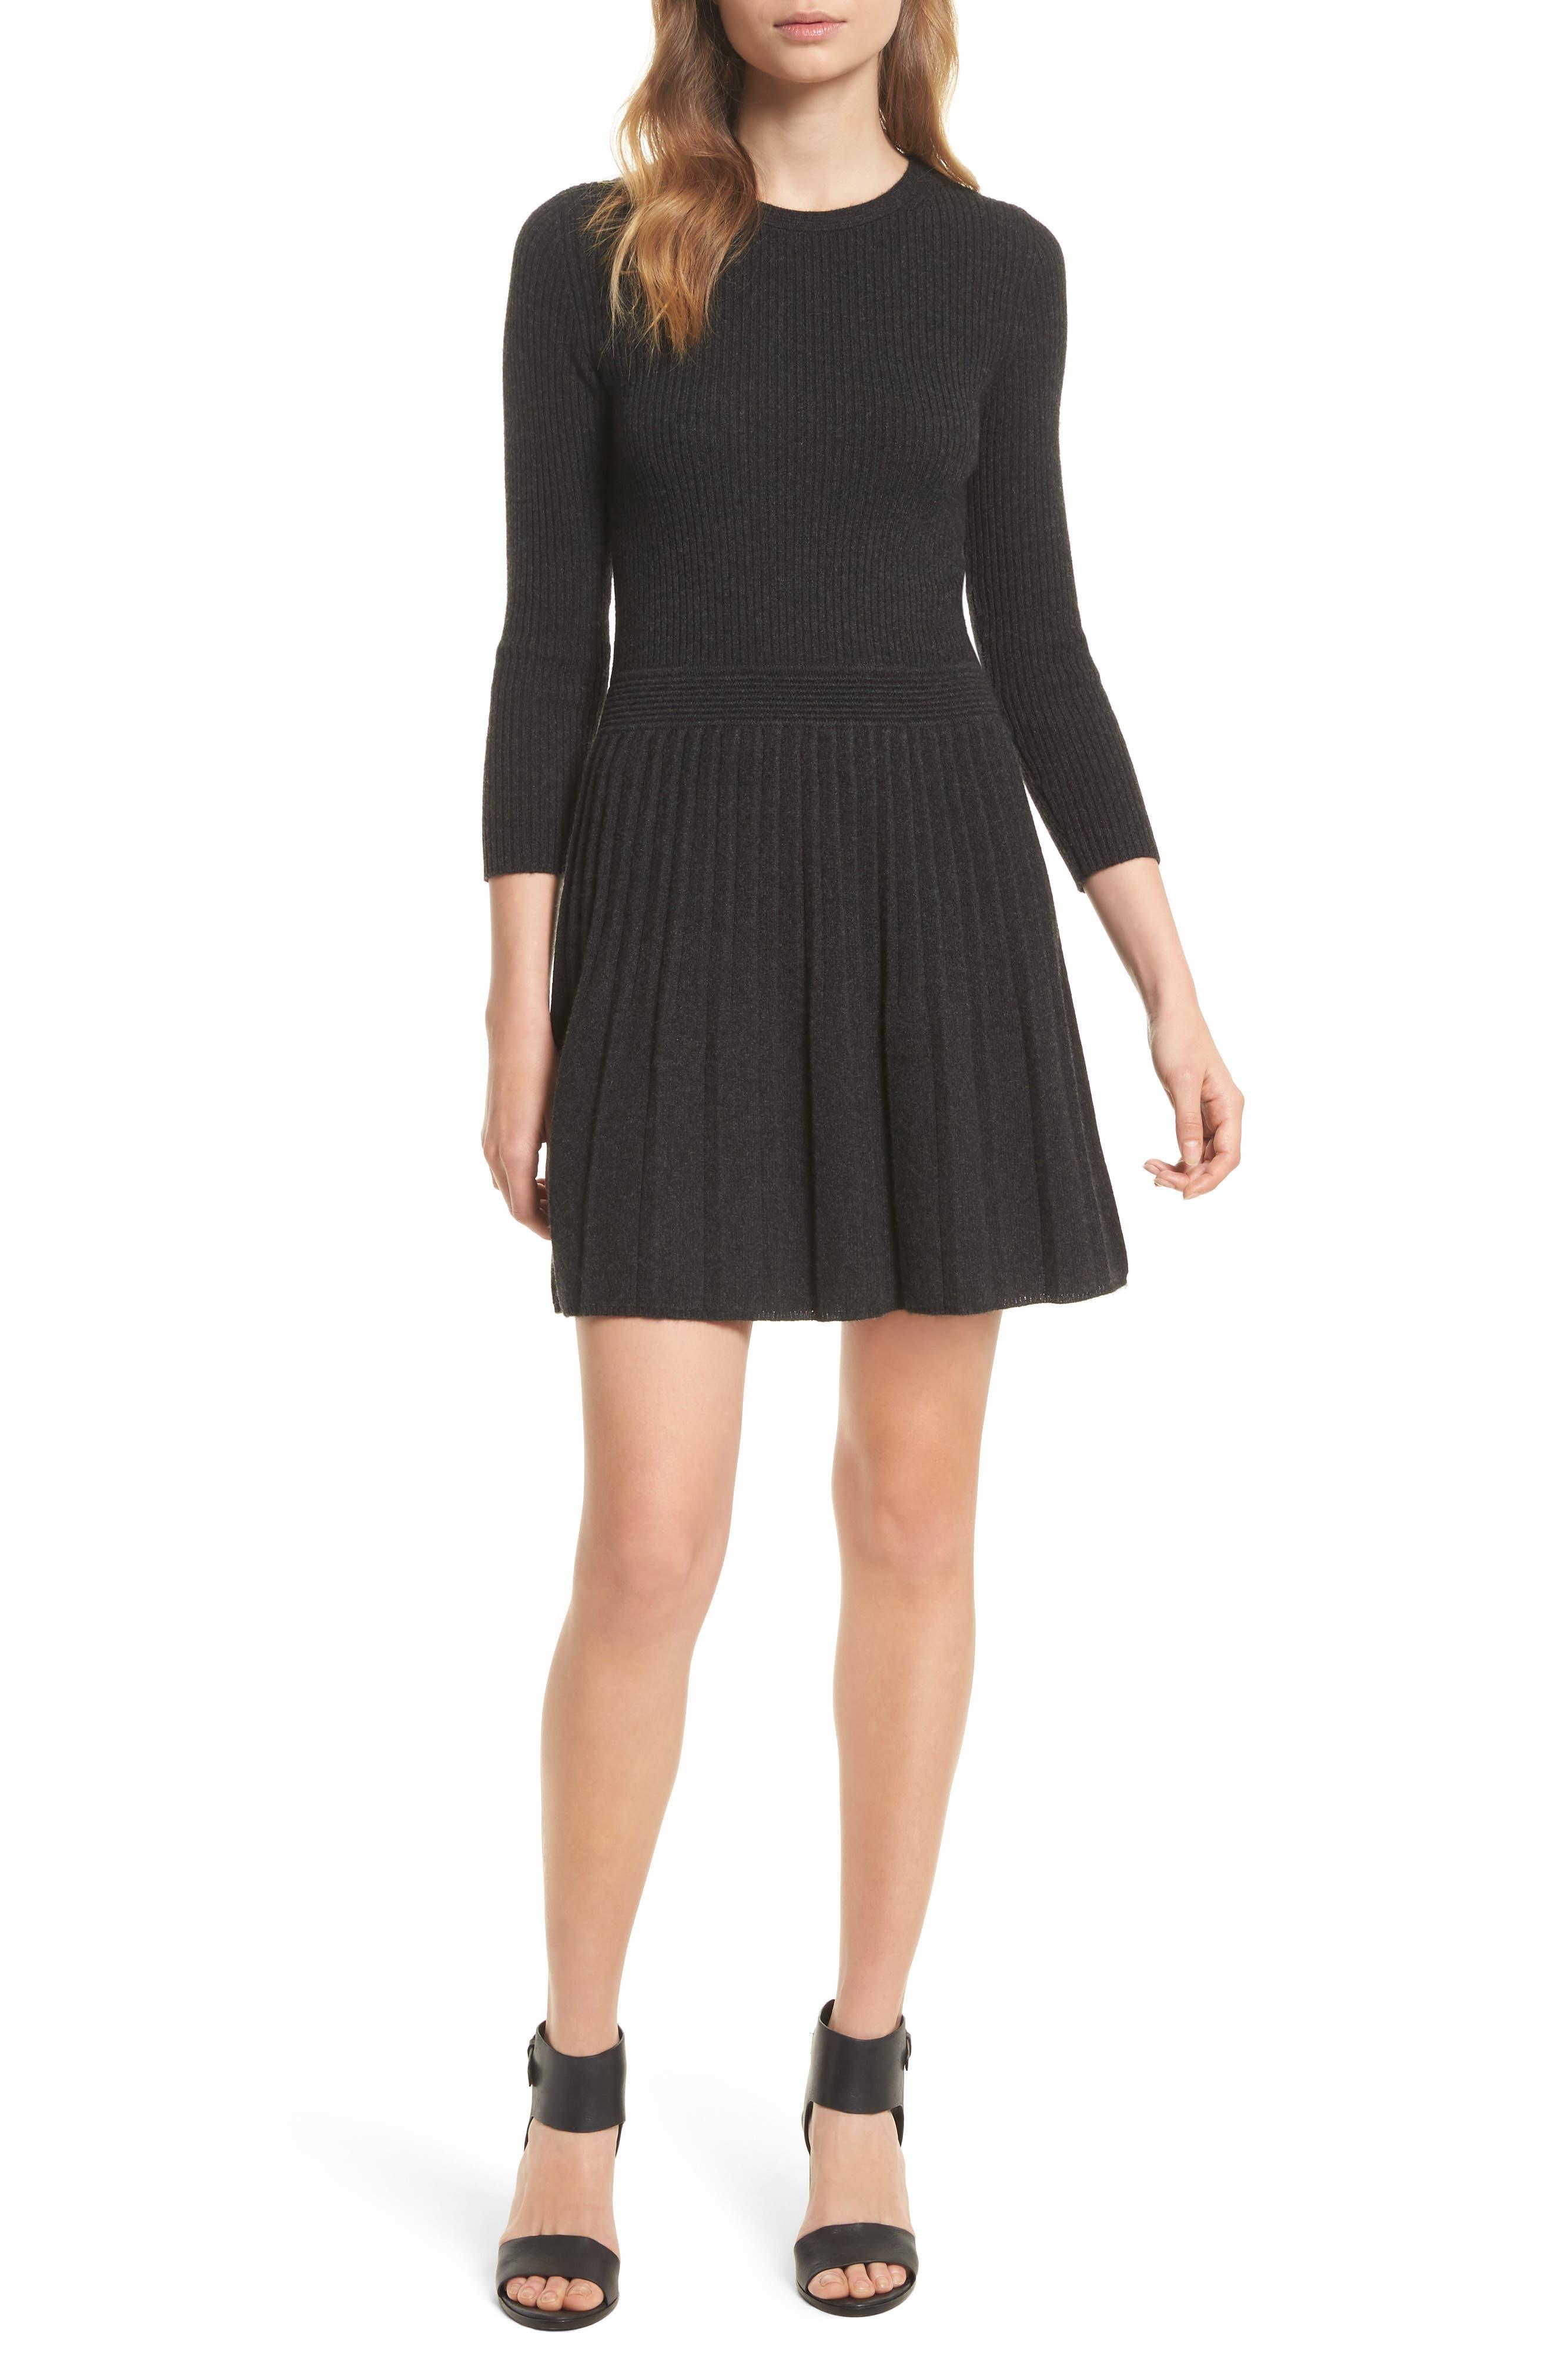 Black dress boots size 7 knitting